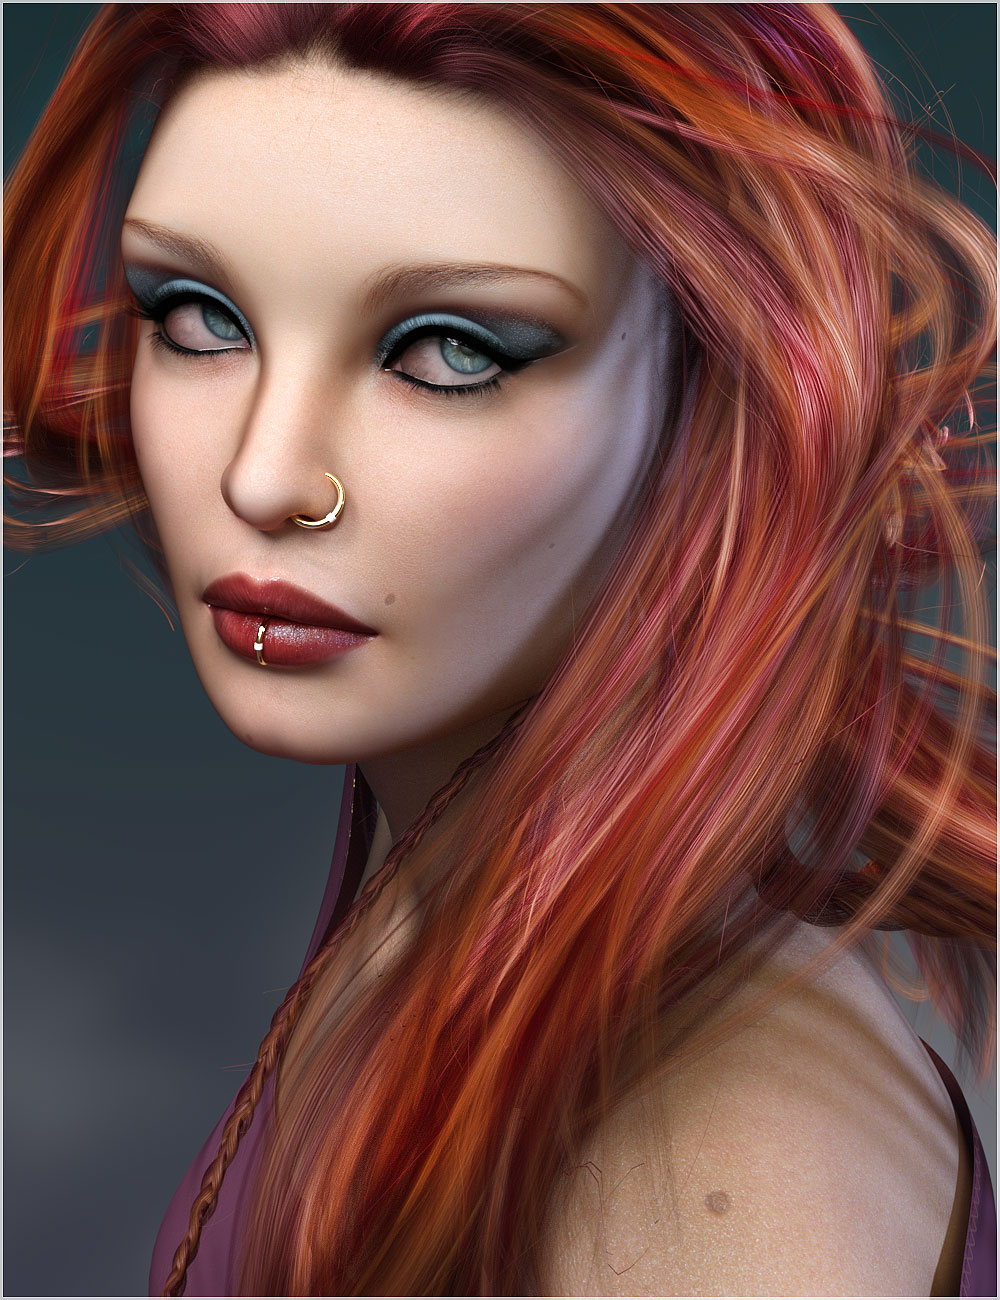 Ghayad for Genesis 8 Females by: Belladzines, 3D Models by Daz 3D